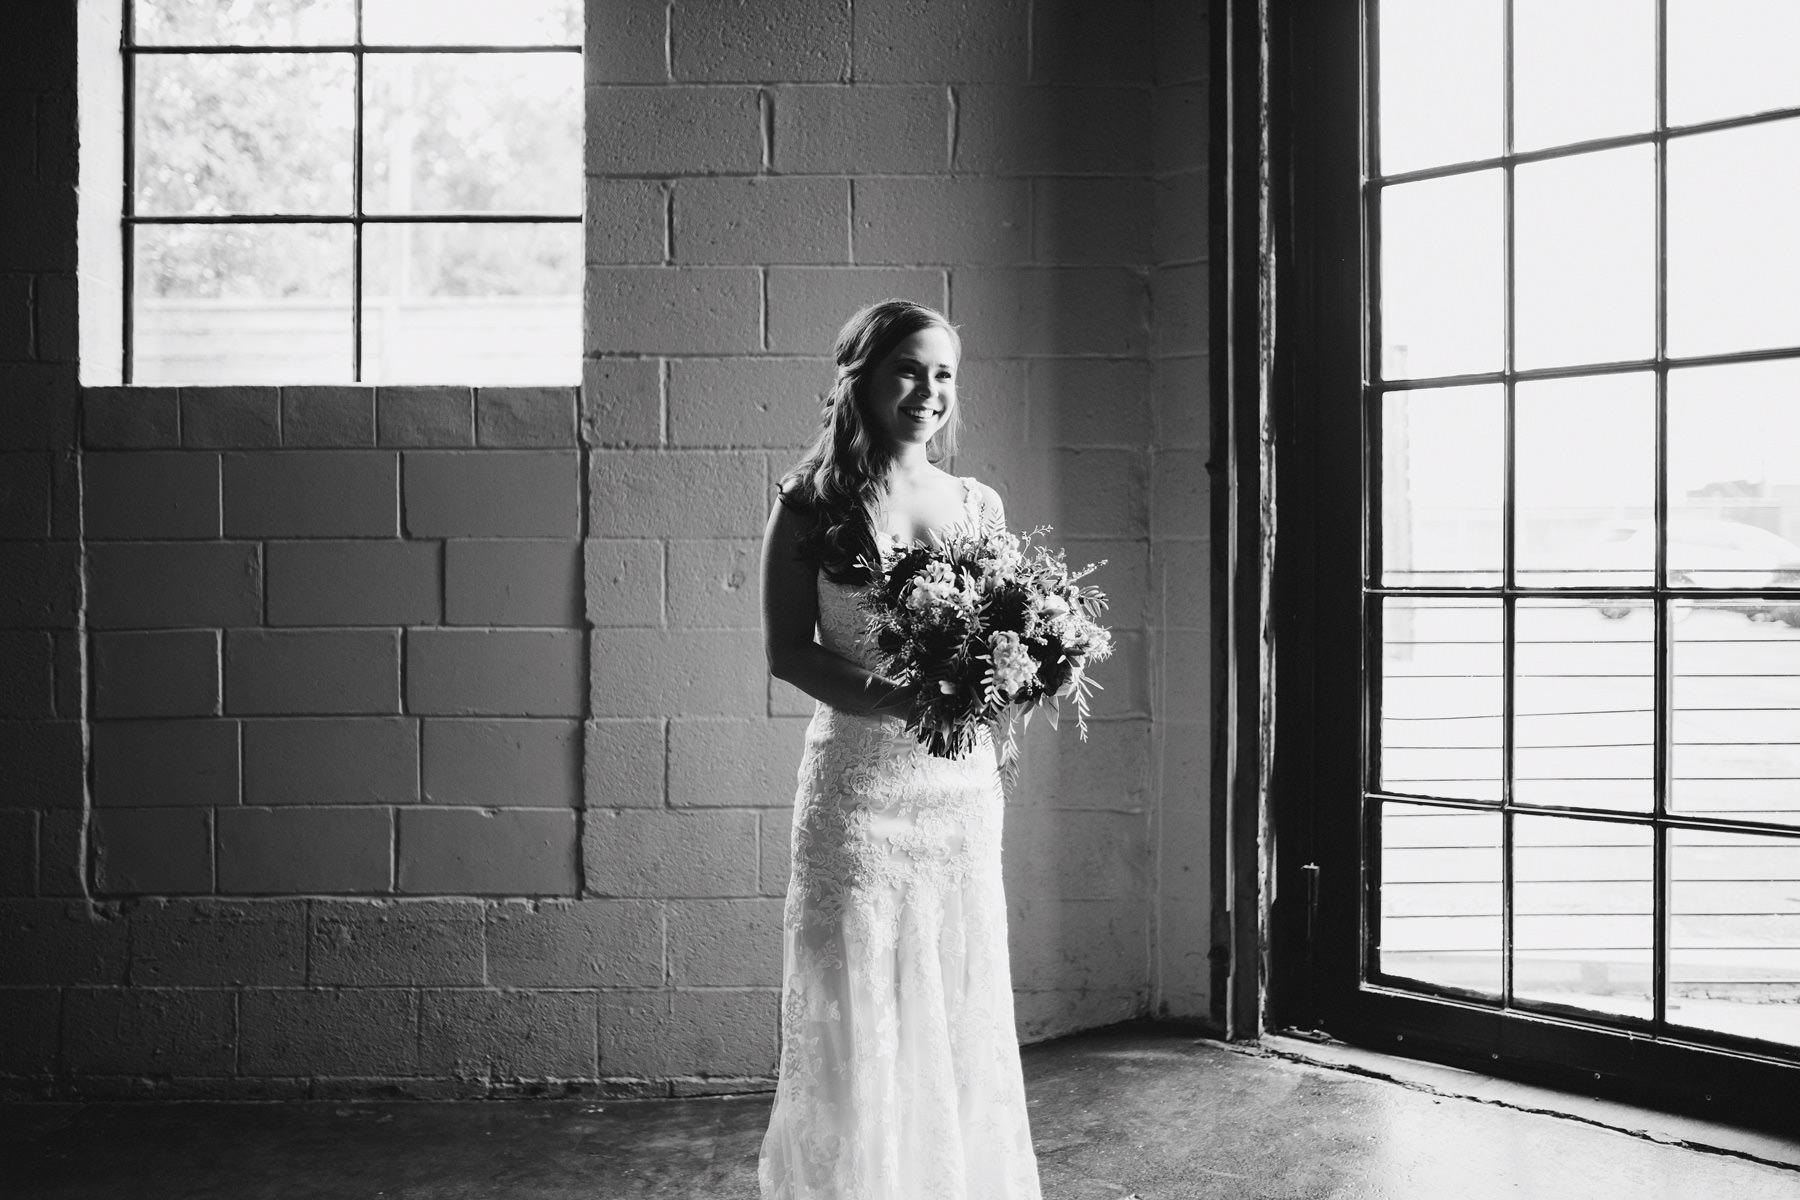 Kansas City Summer Wedding at the Guild_Kindling Wedding Photography Blog29.JPG